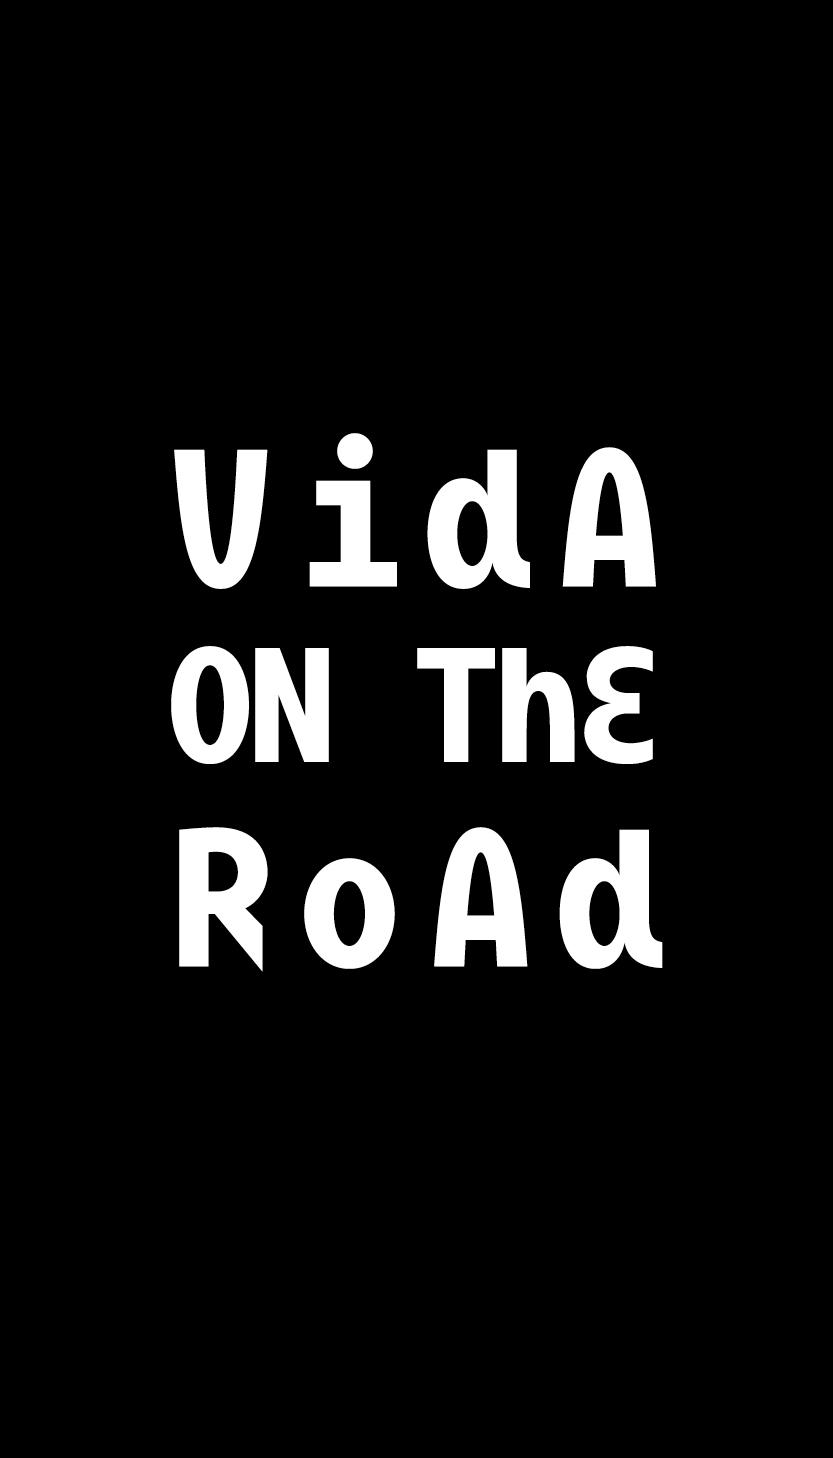 VidaOnTheRoad_700x400_V3 (1).jpg